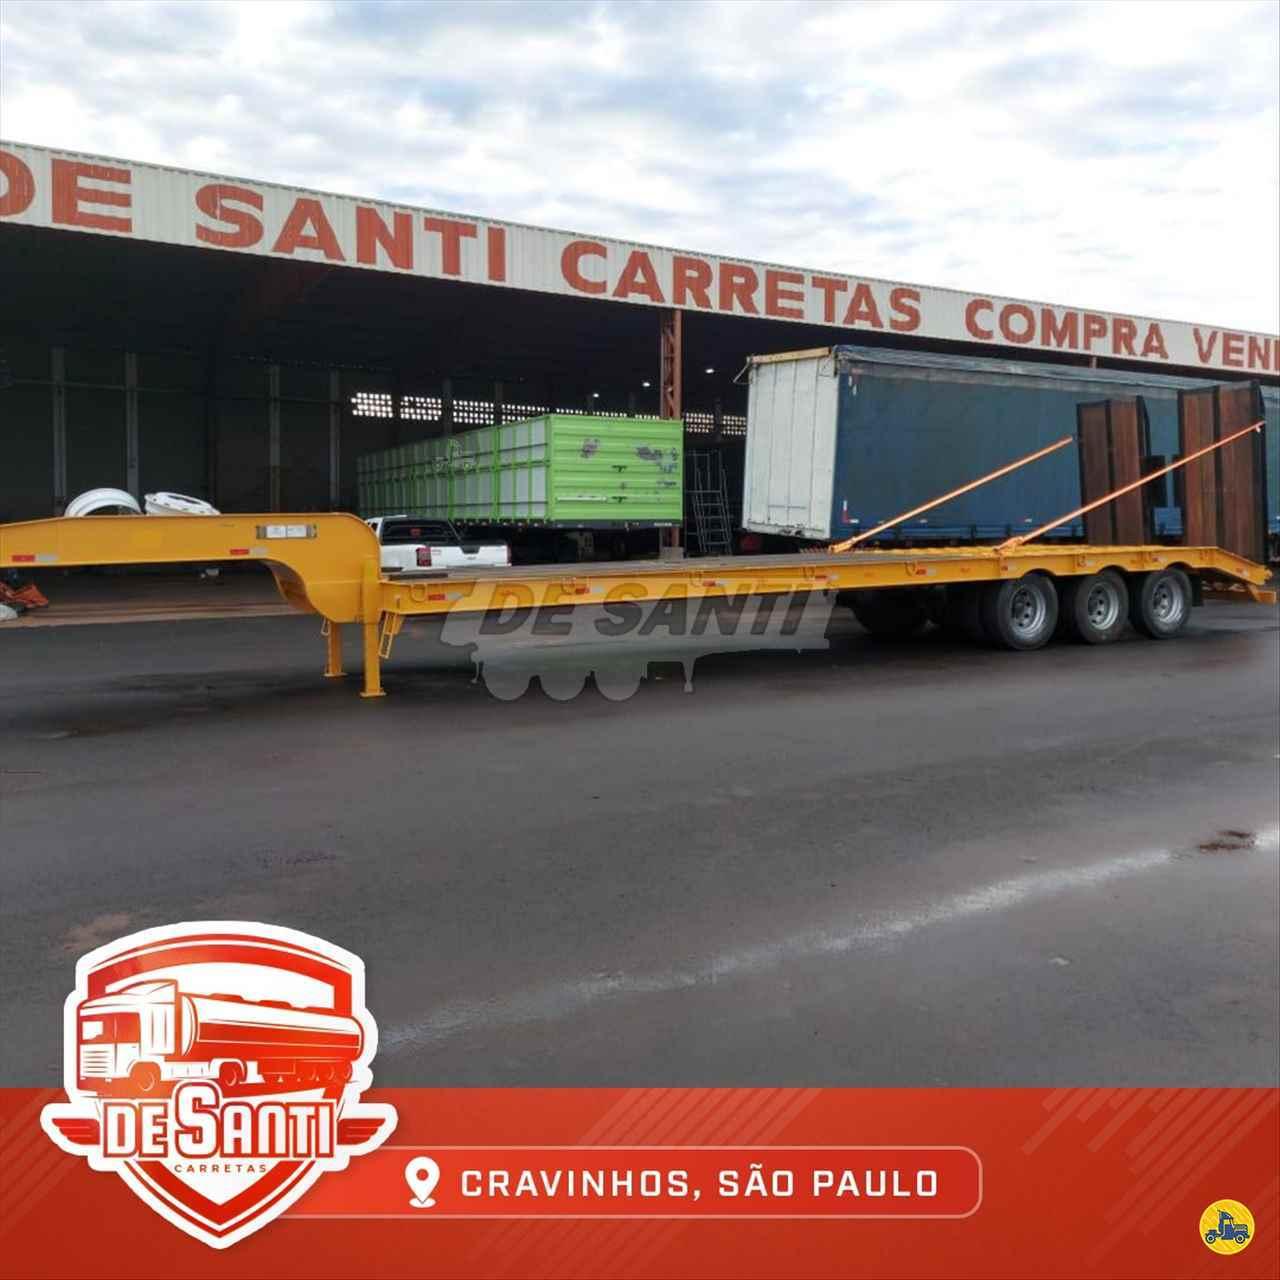 PRANCHA de De Santi Carretas - CRAVINHOS/SP